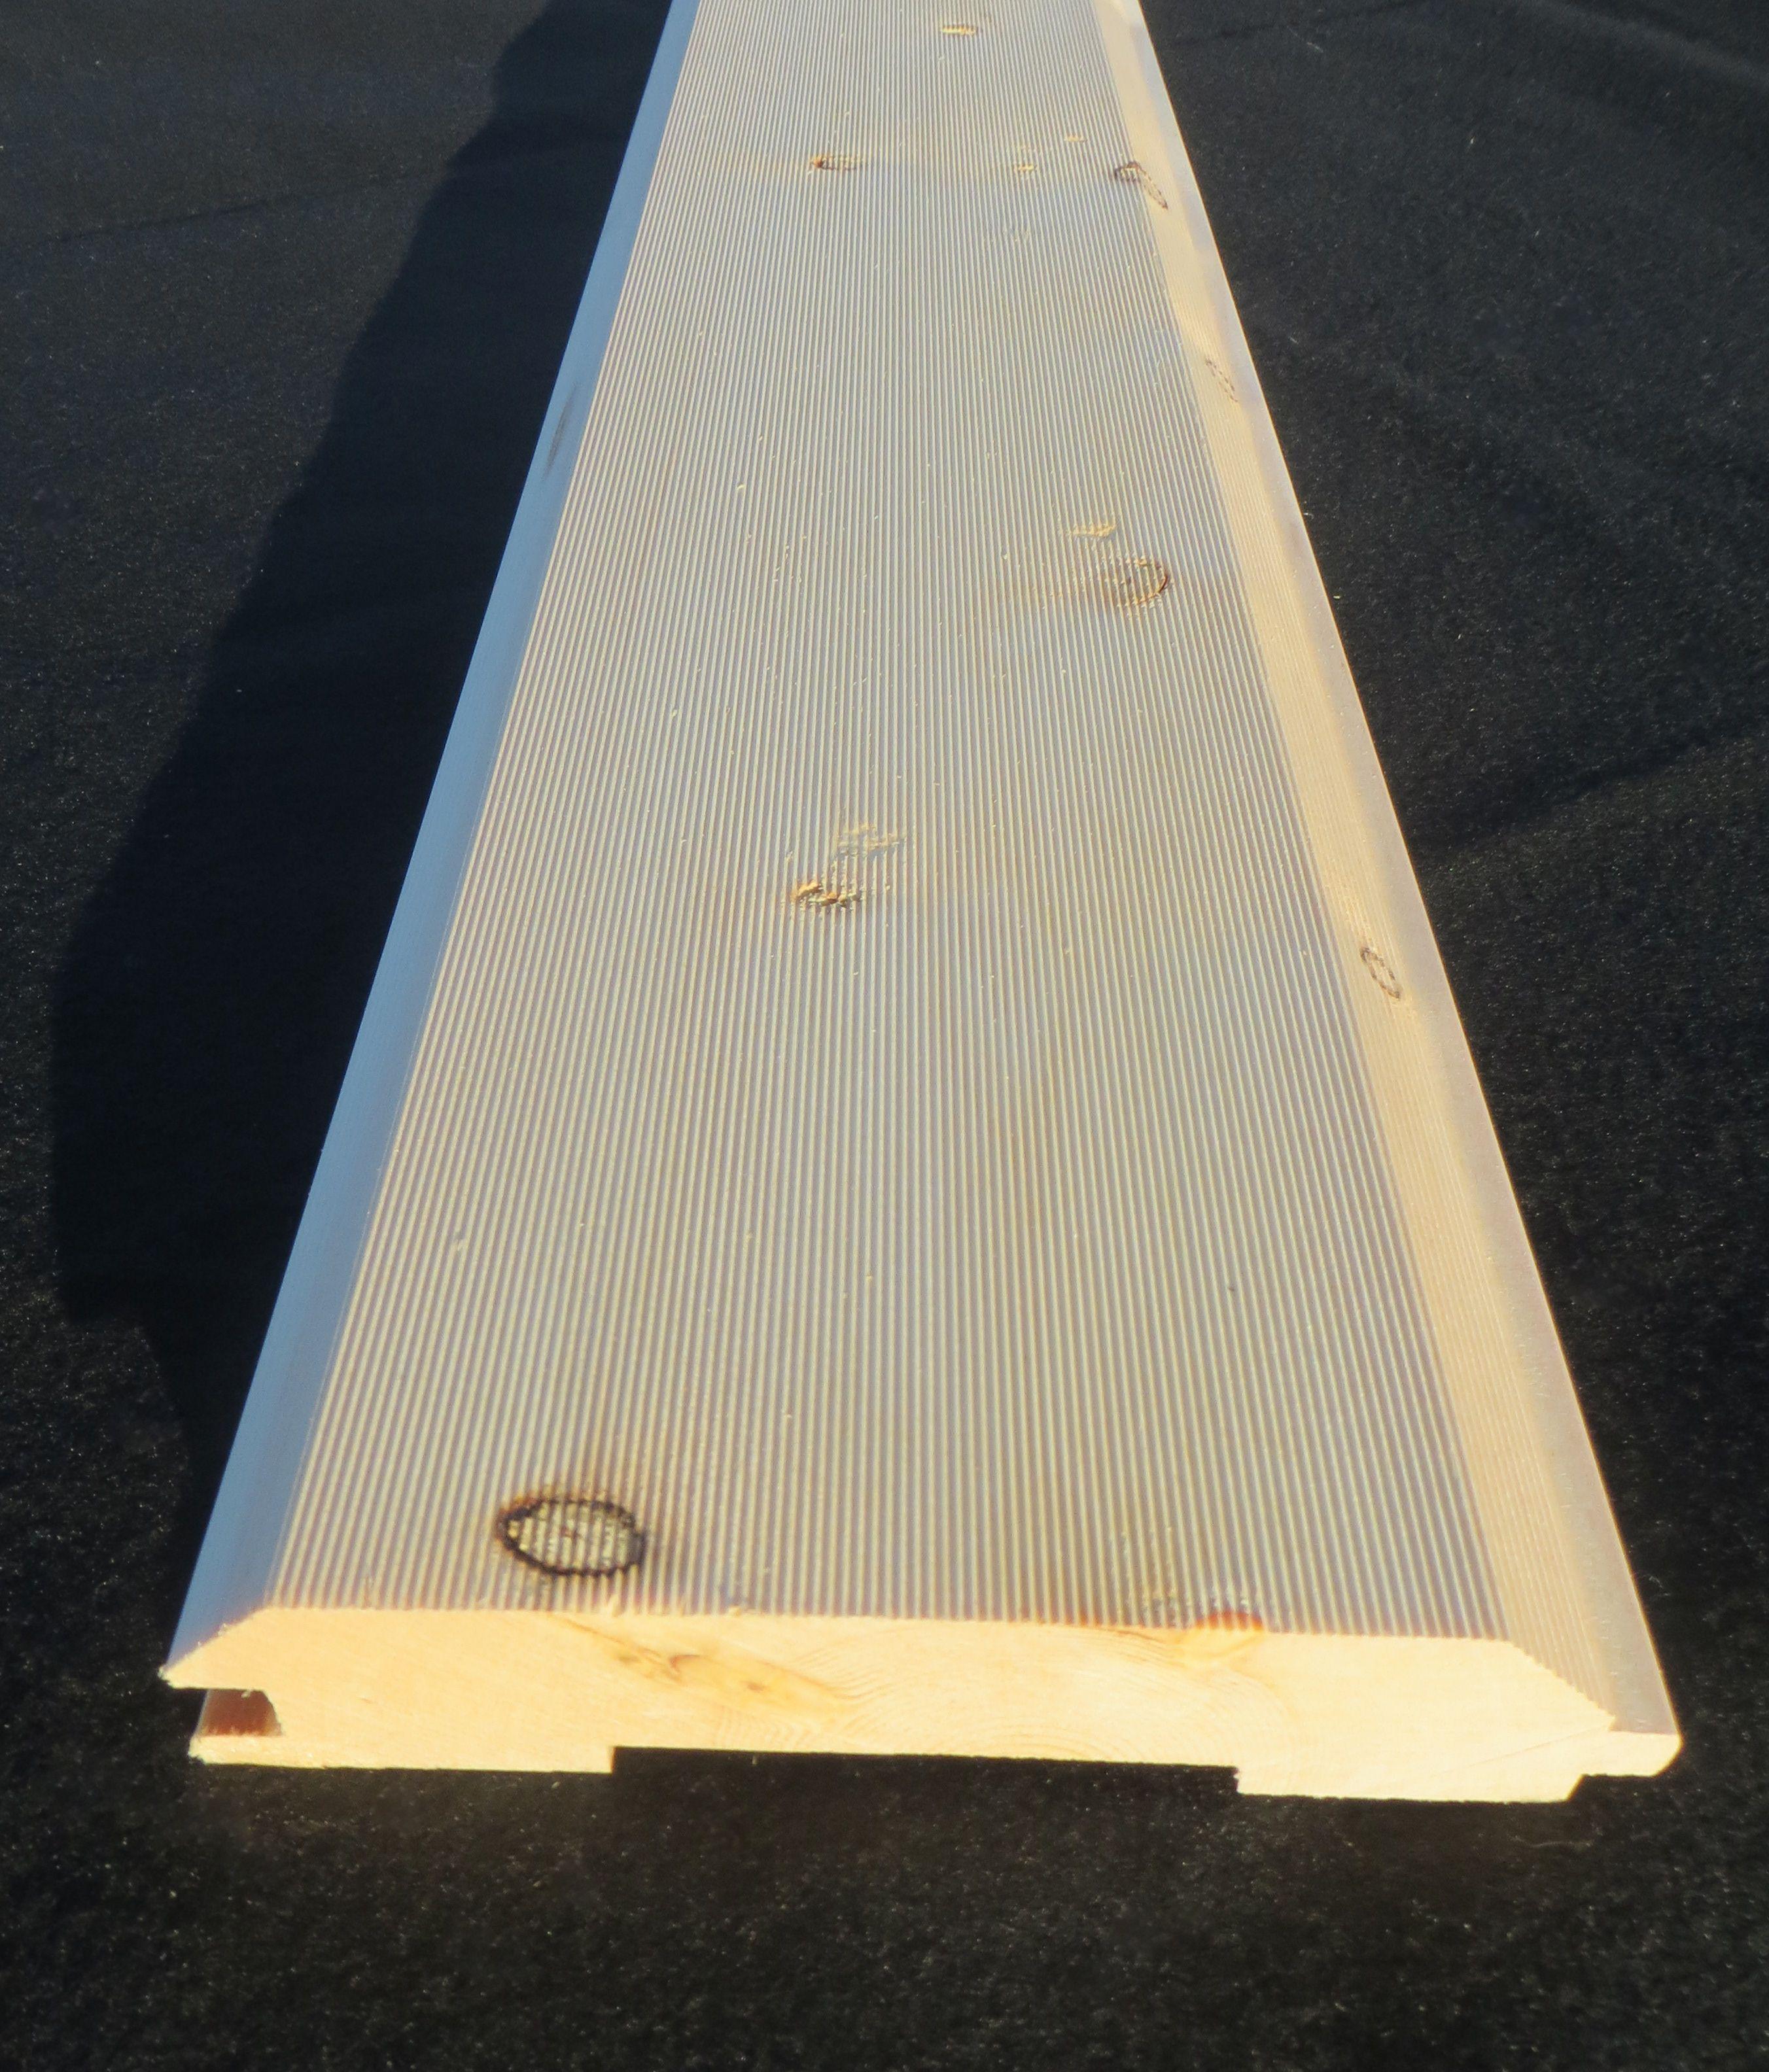 3x8 log siding hand hewn pine - 2x8 Combed Log Timber Siding